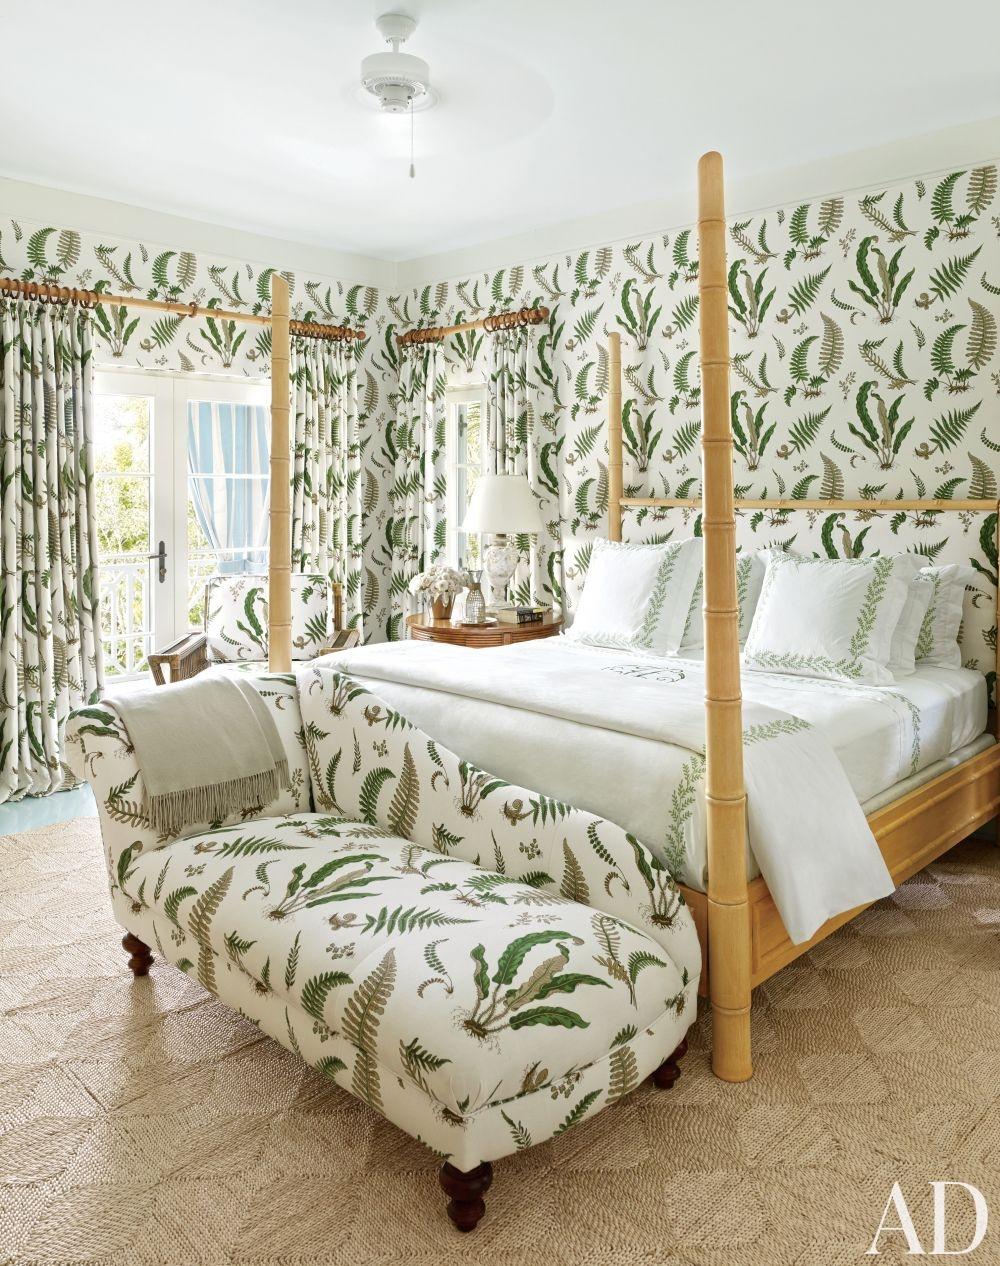 beach-bedroom-miles-redd-lyford-cay-bahamas-201308-3_1000-watermarked Master Bedroom Trends 2015 – Master Bedroom Furniture Ideas beach bedroom miles redd lyford cay bahamas 201308 3 1000 watermarked